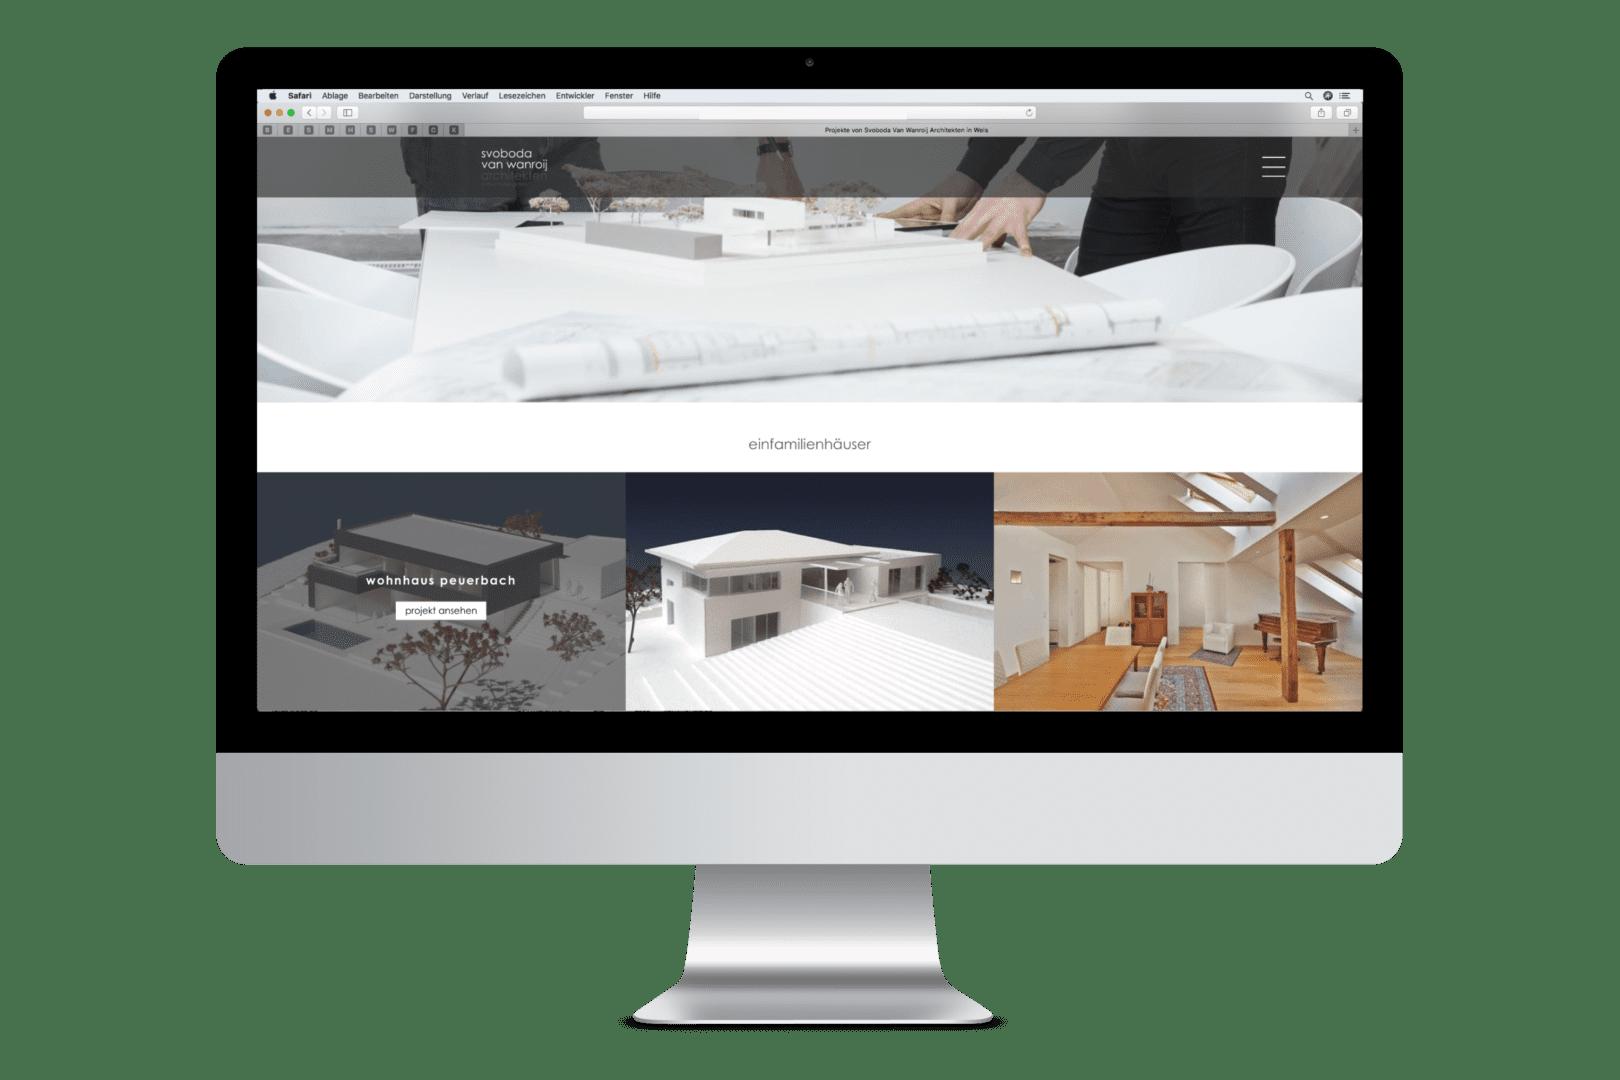 svw-projekte-overlay-imac